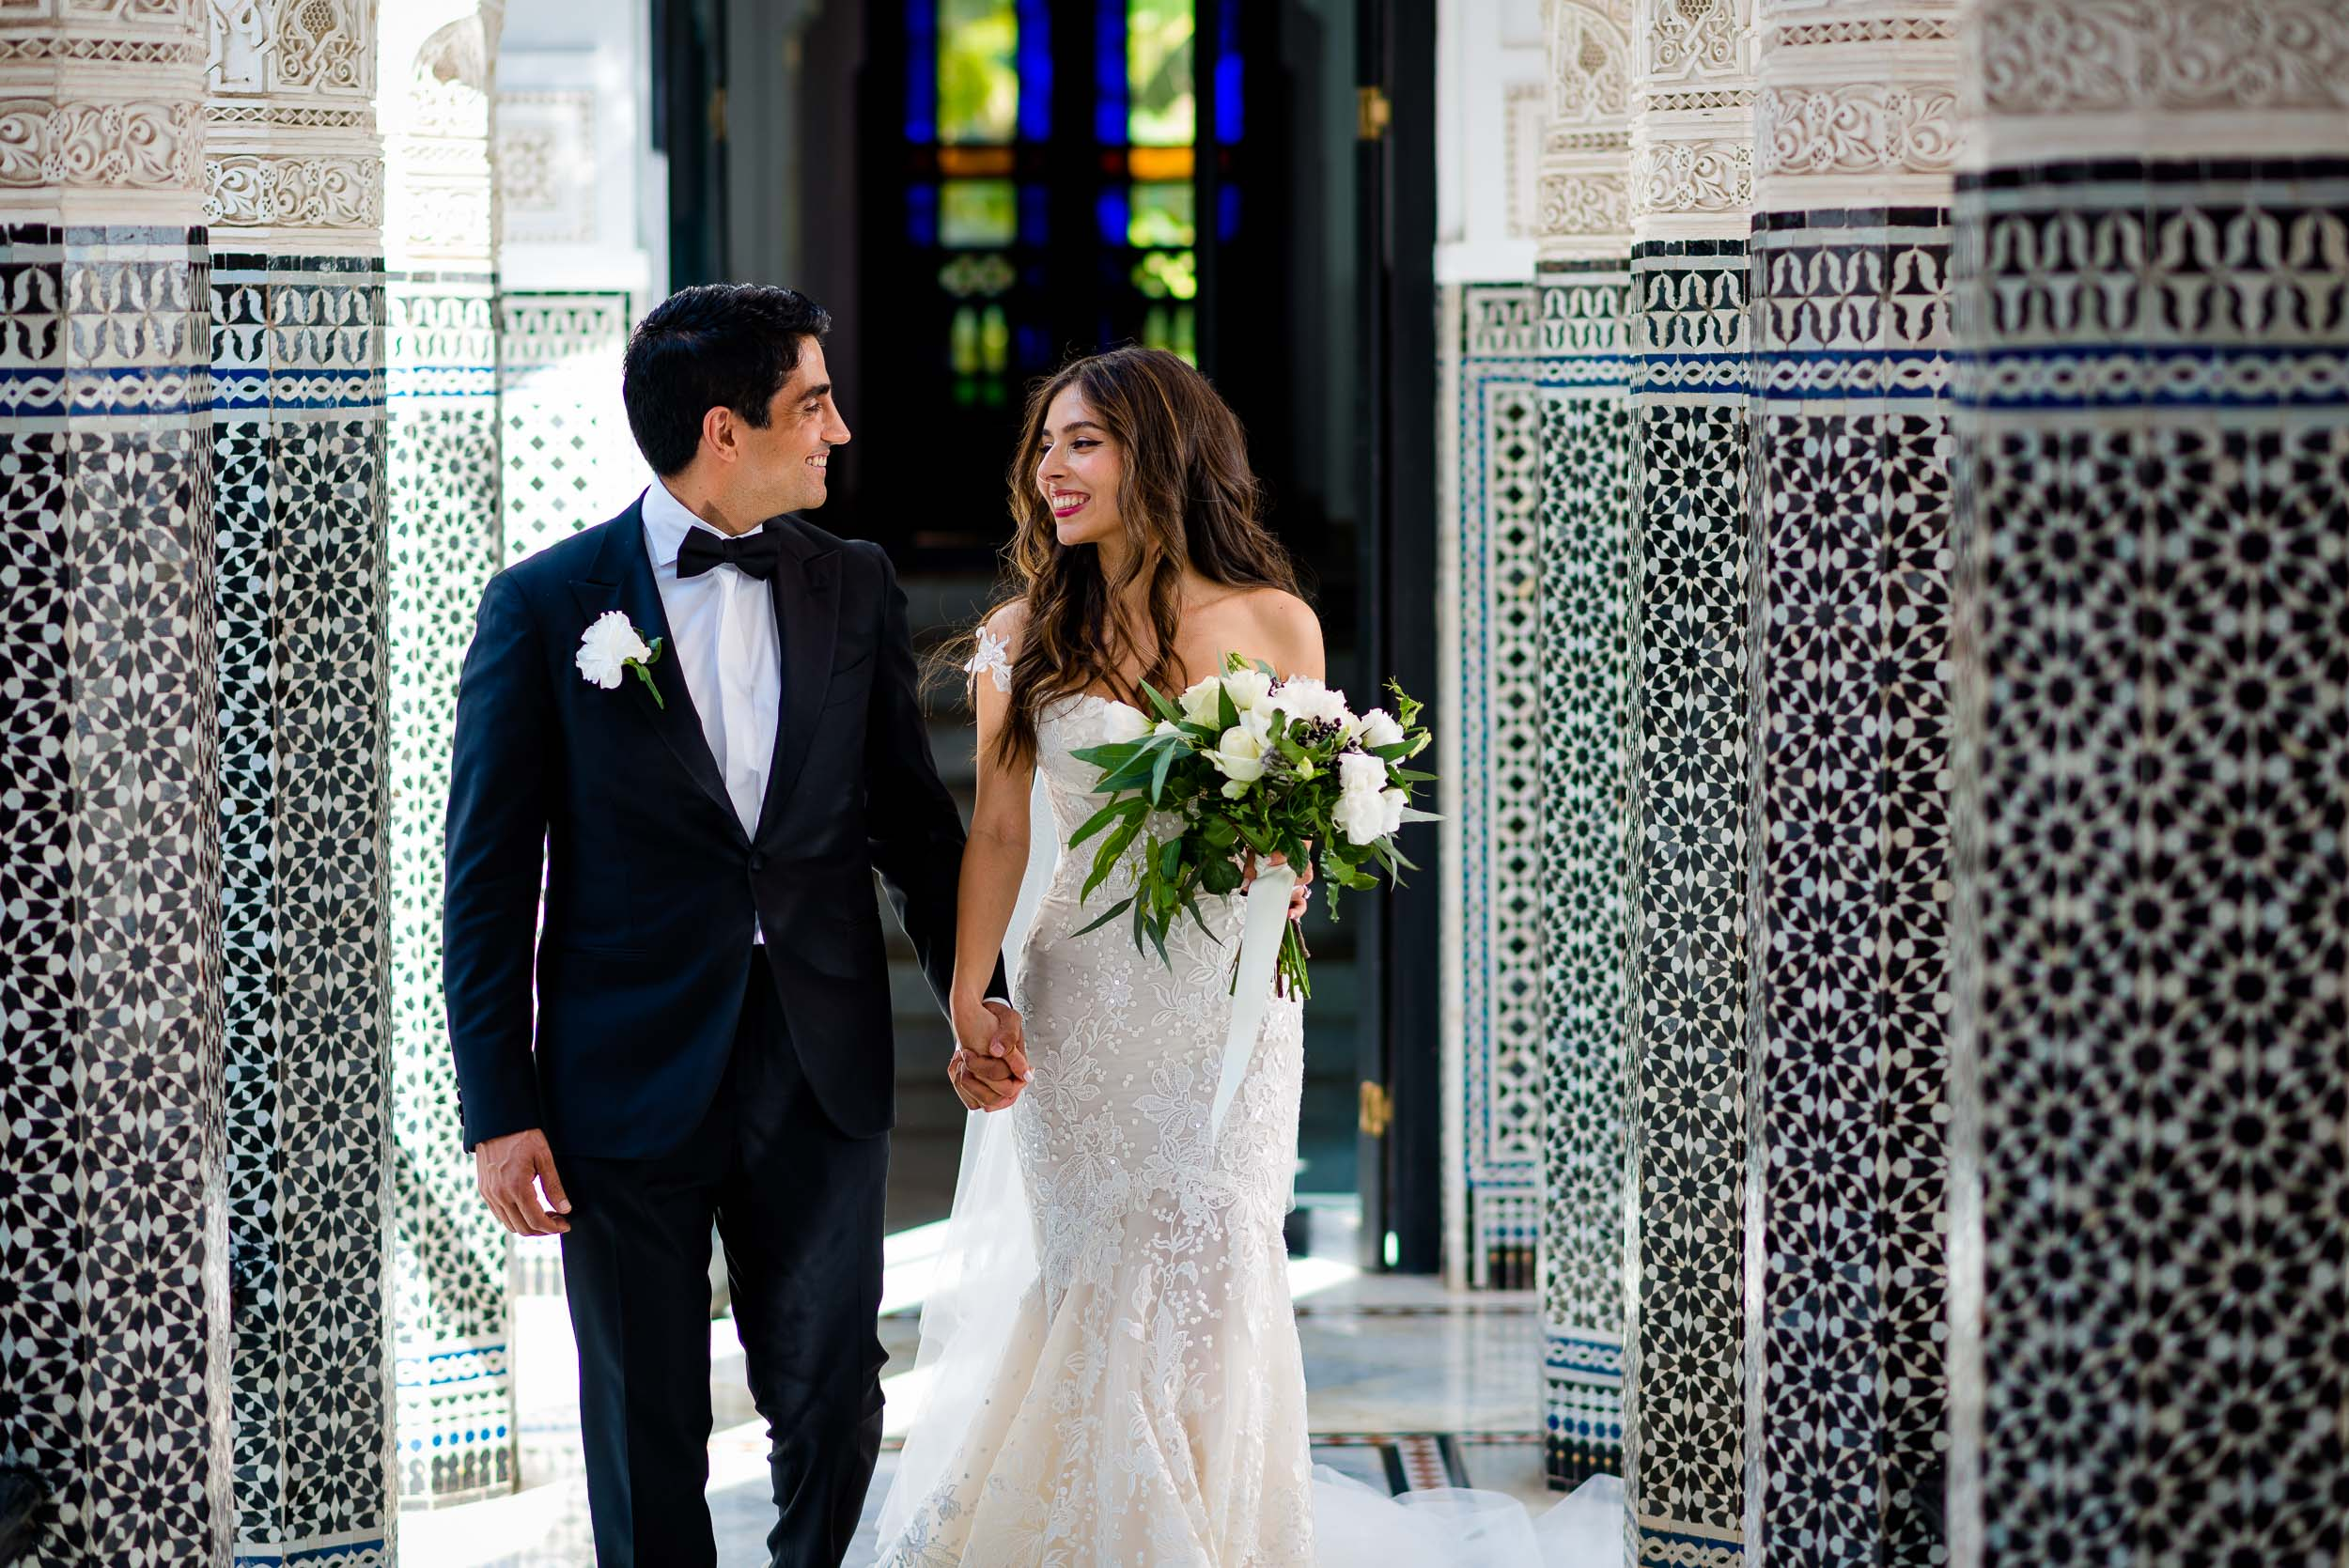 destination-wedding-photographer-will-wareham-photo-5005.jpg